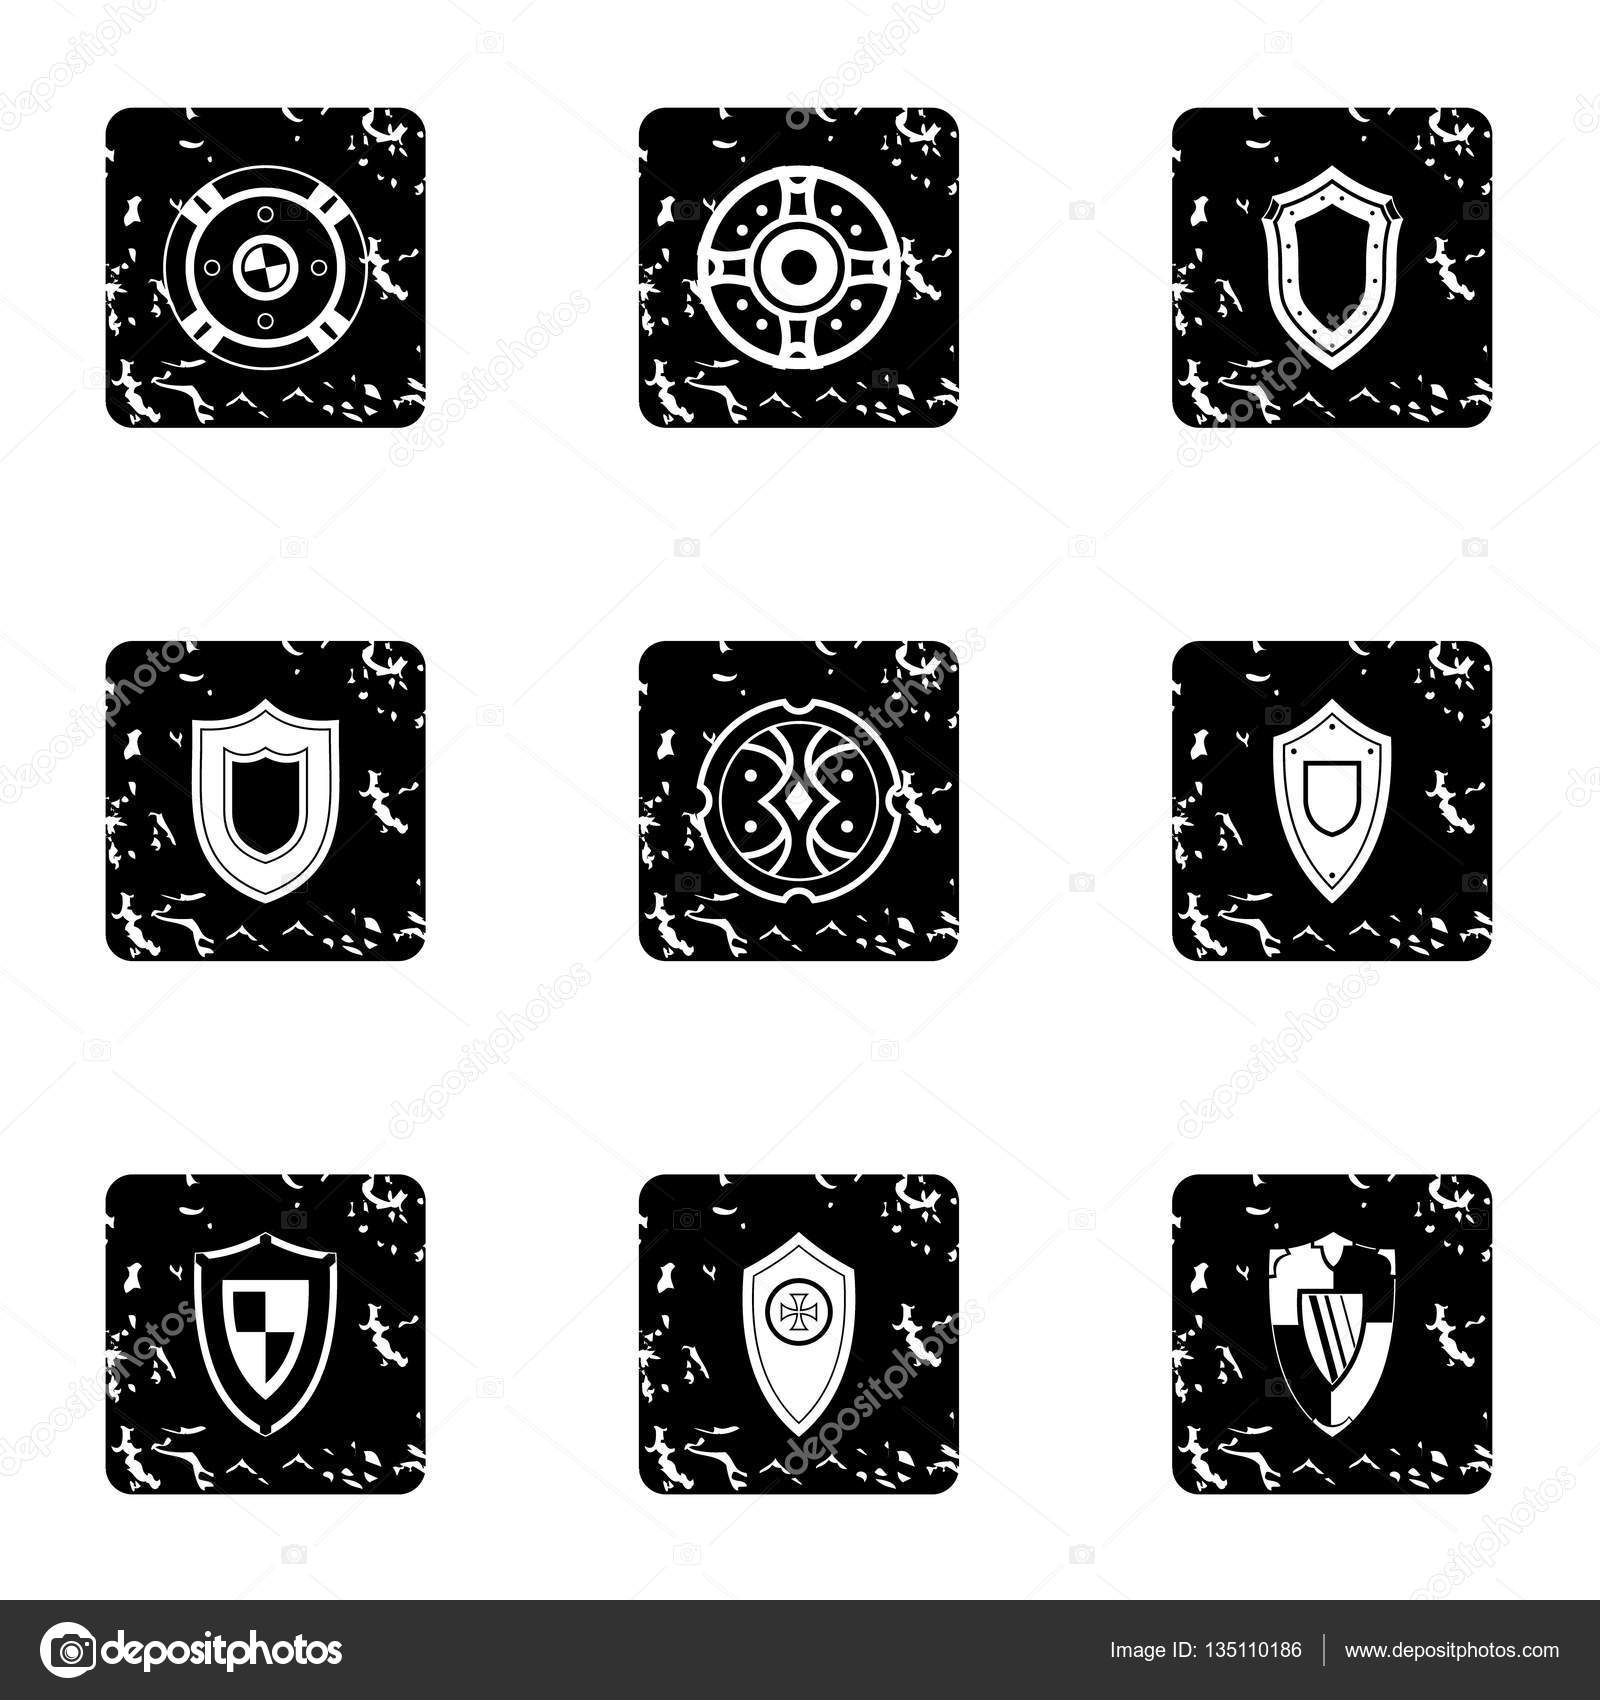 Grunge shield stock vector Illustration of grunge cobweb